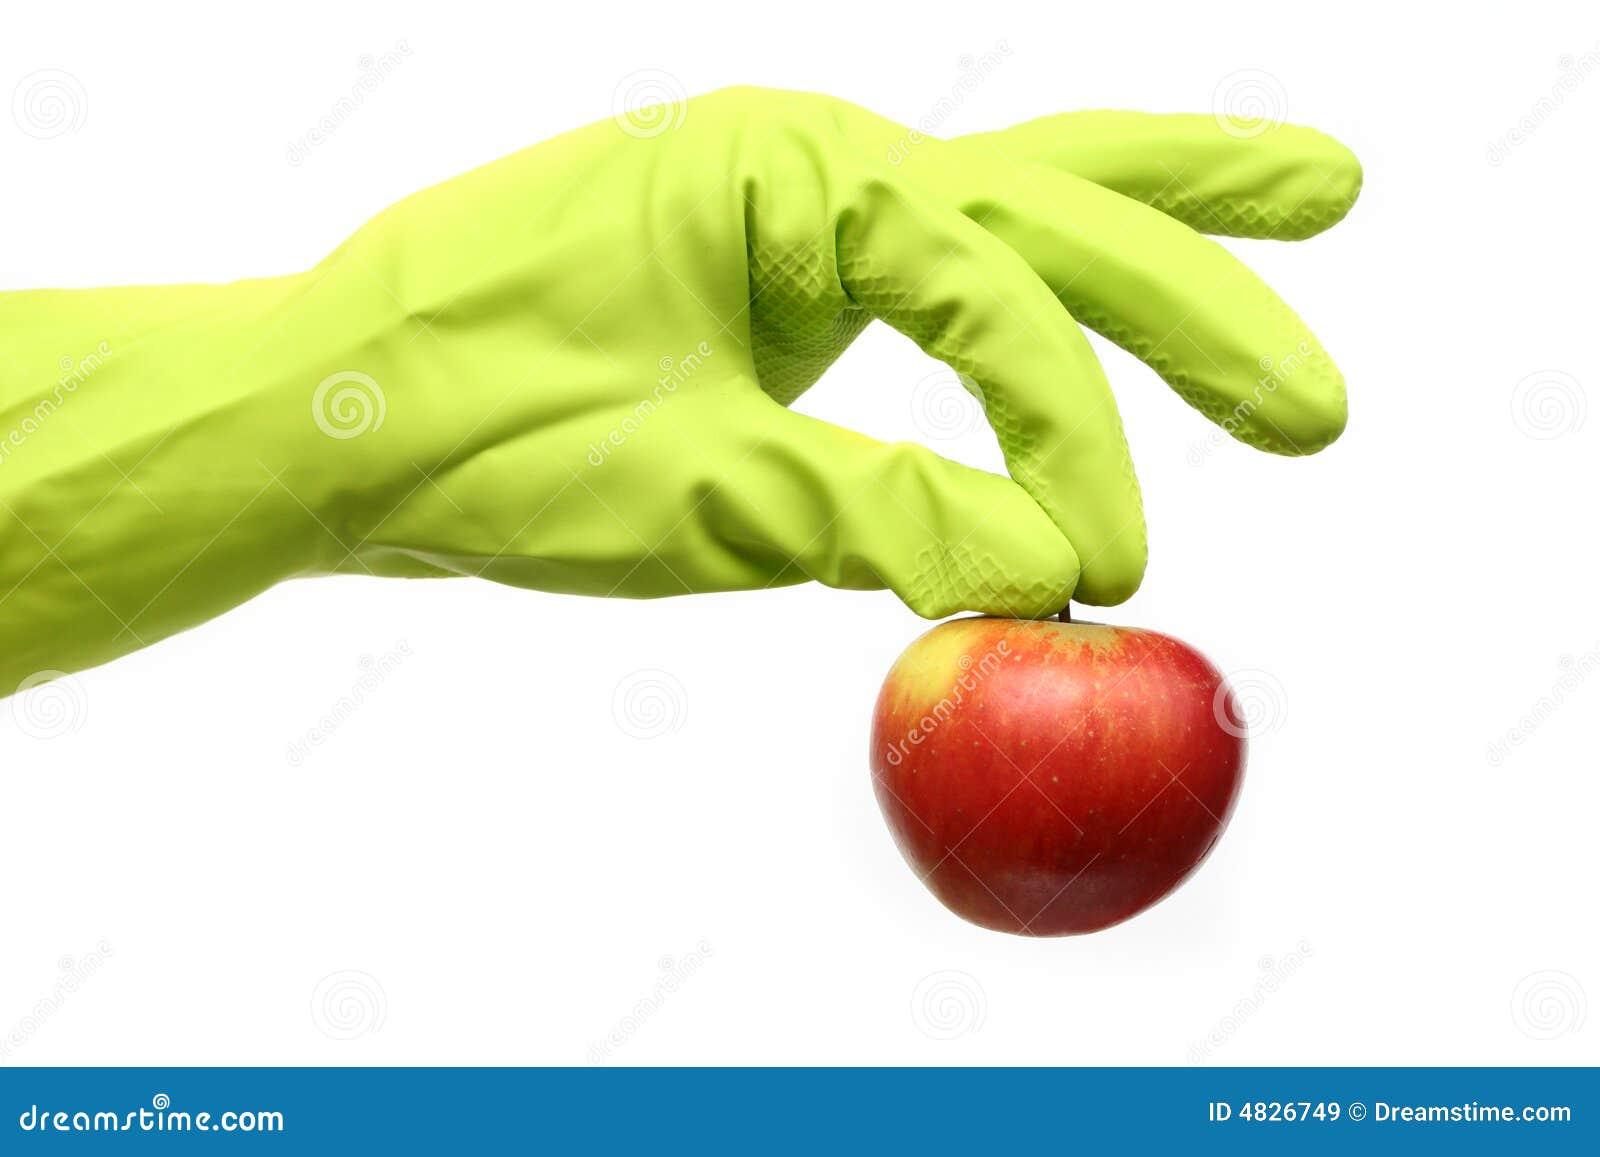 Bioapple